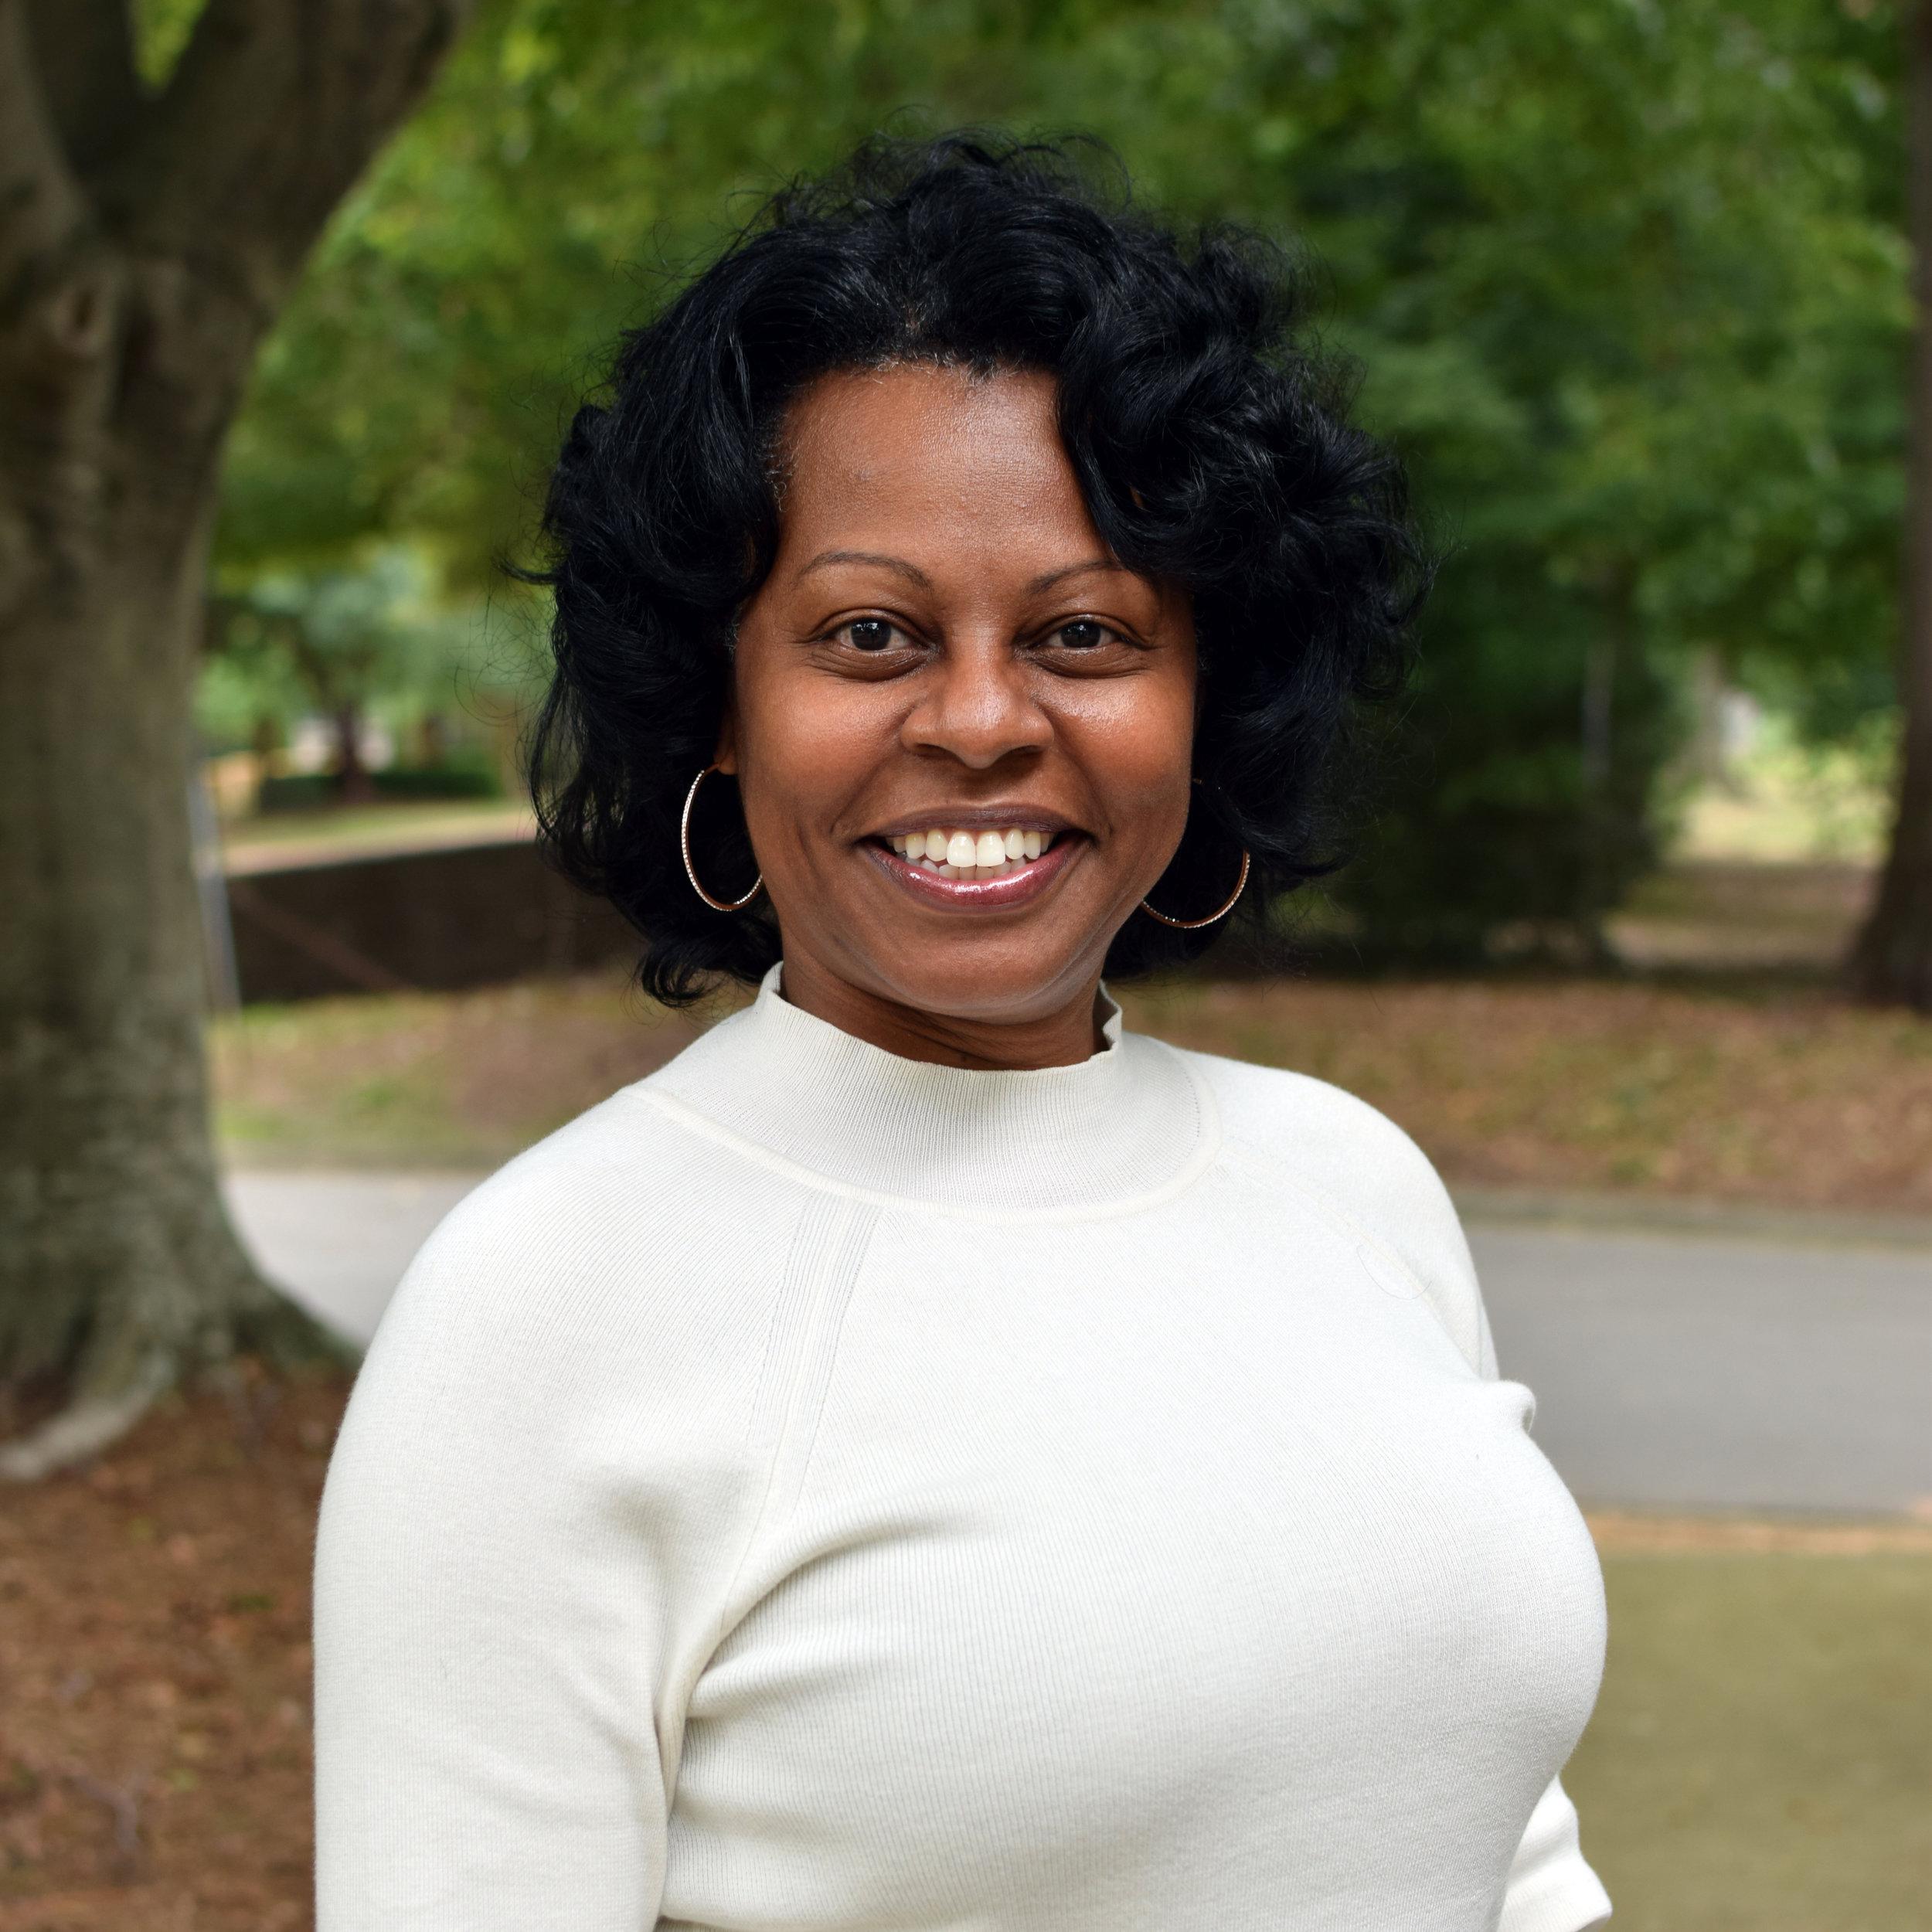 Toneisha Williams